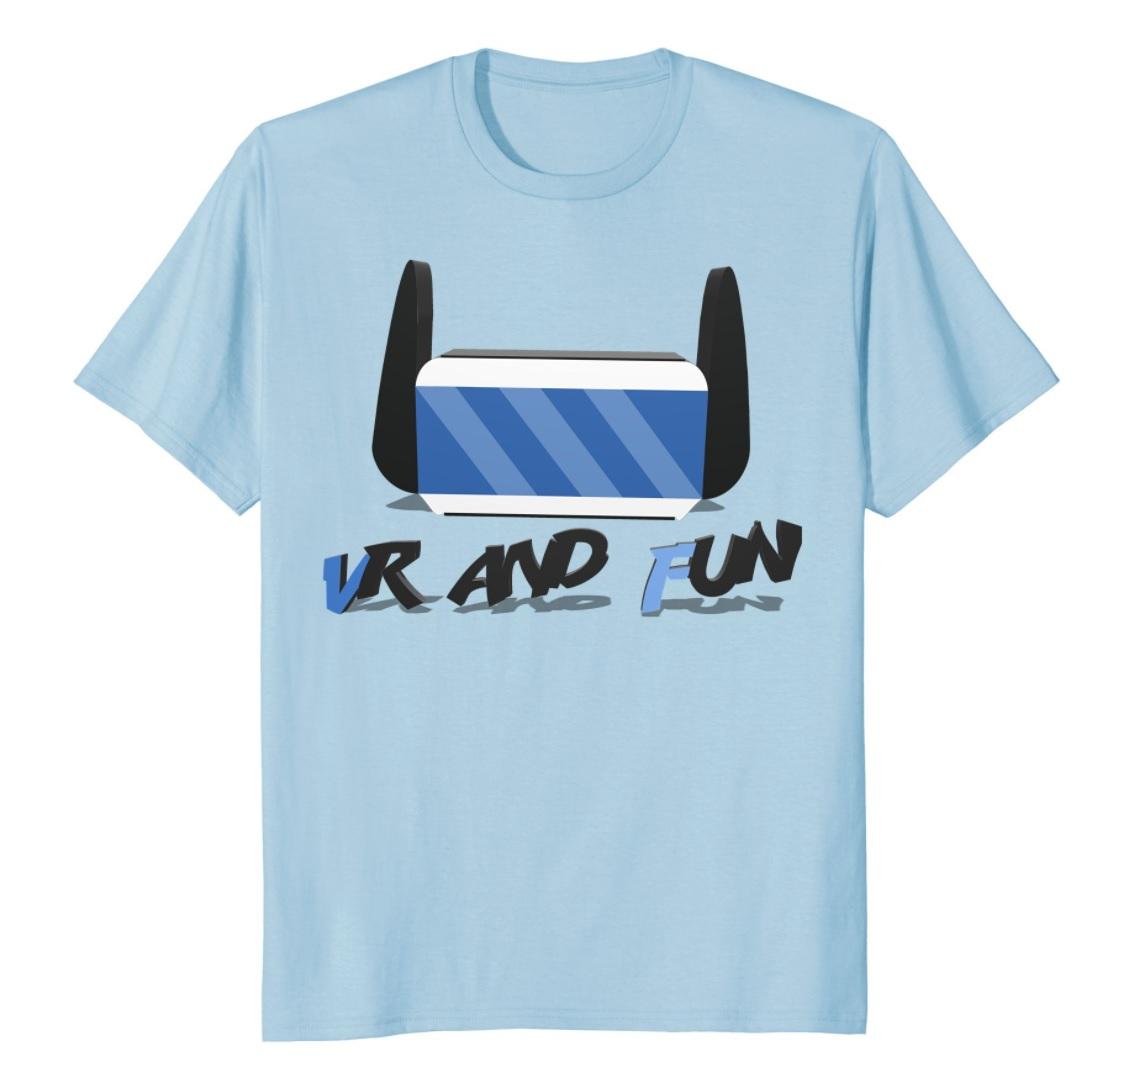 vr and fun t-shirt blue